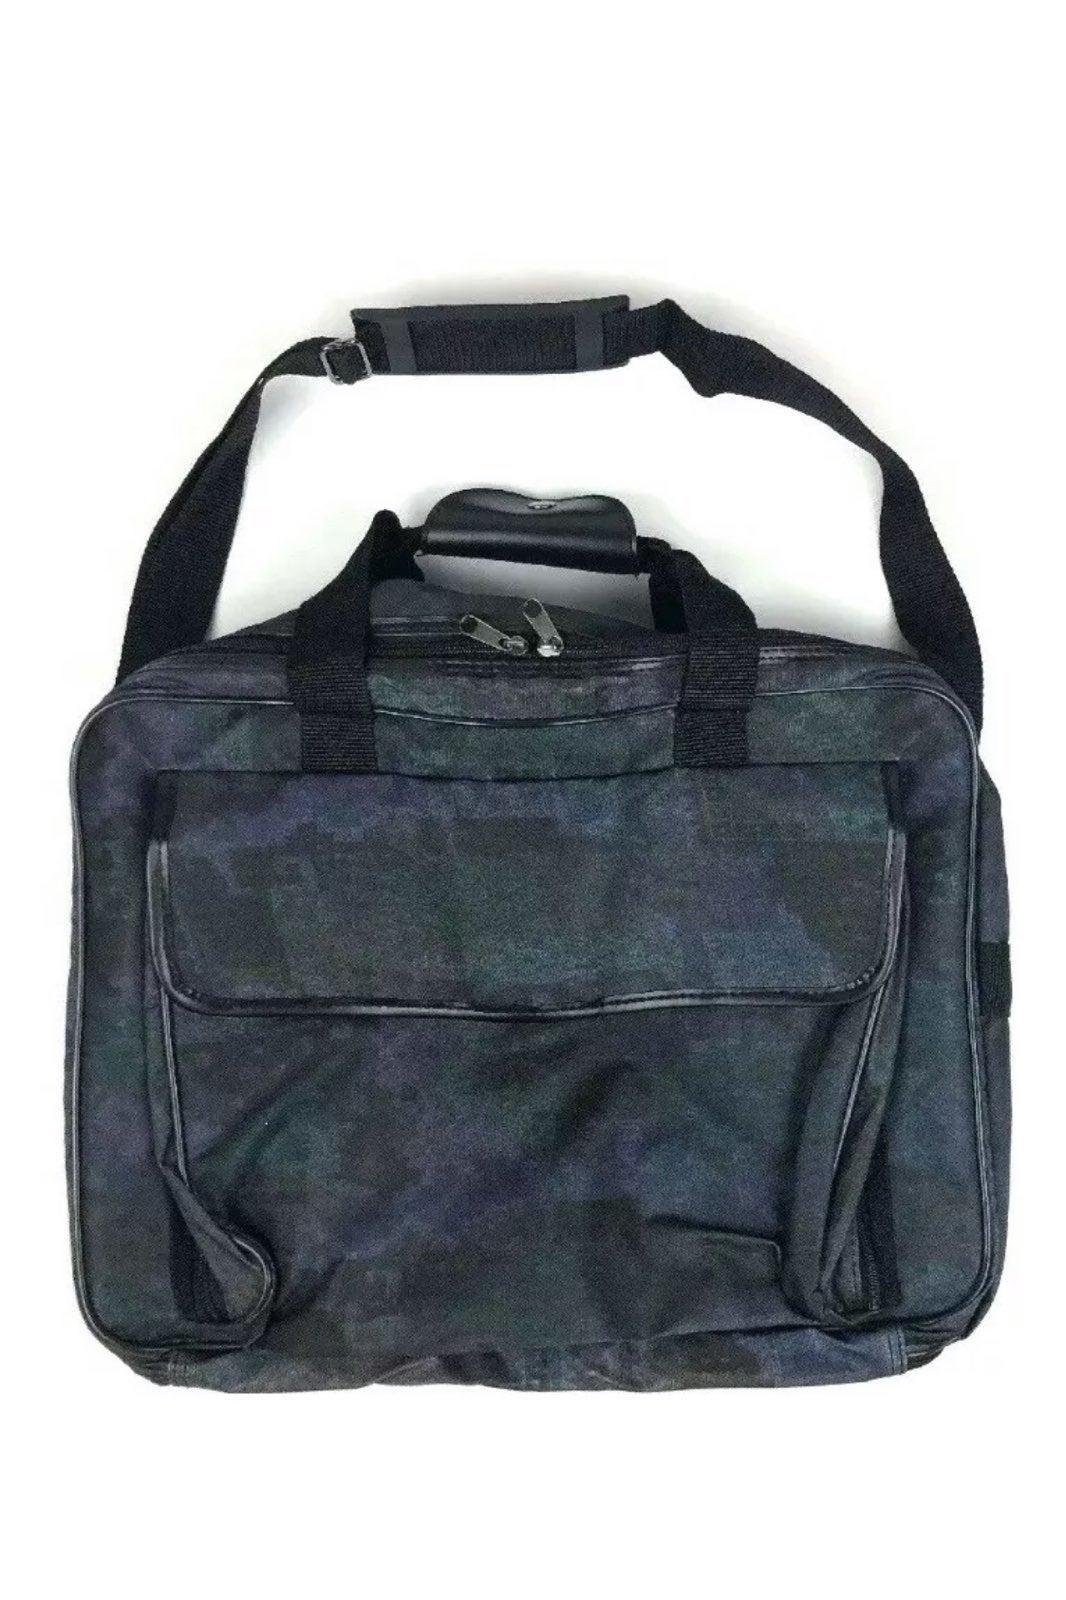 Avon- Phoenix Traveller Bag